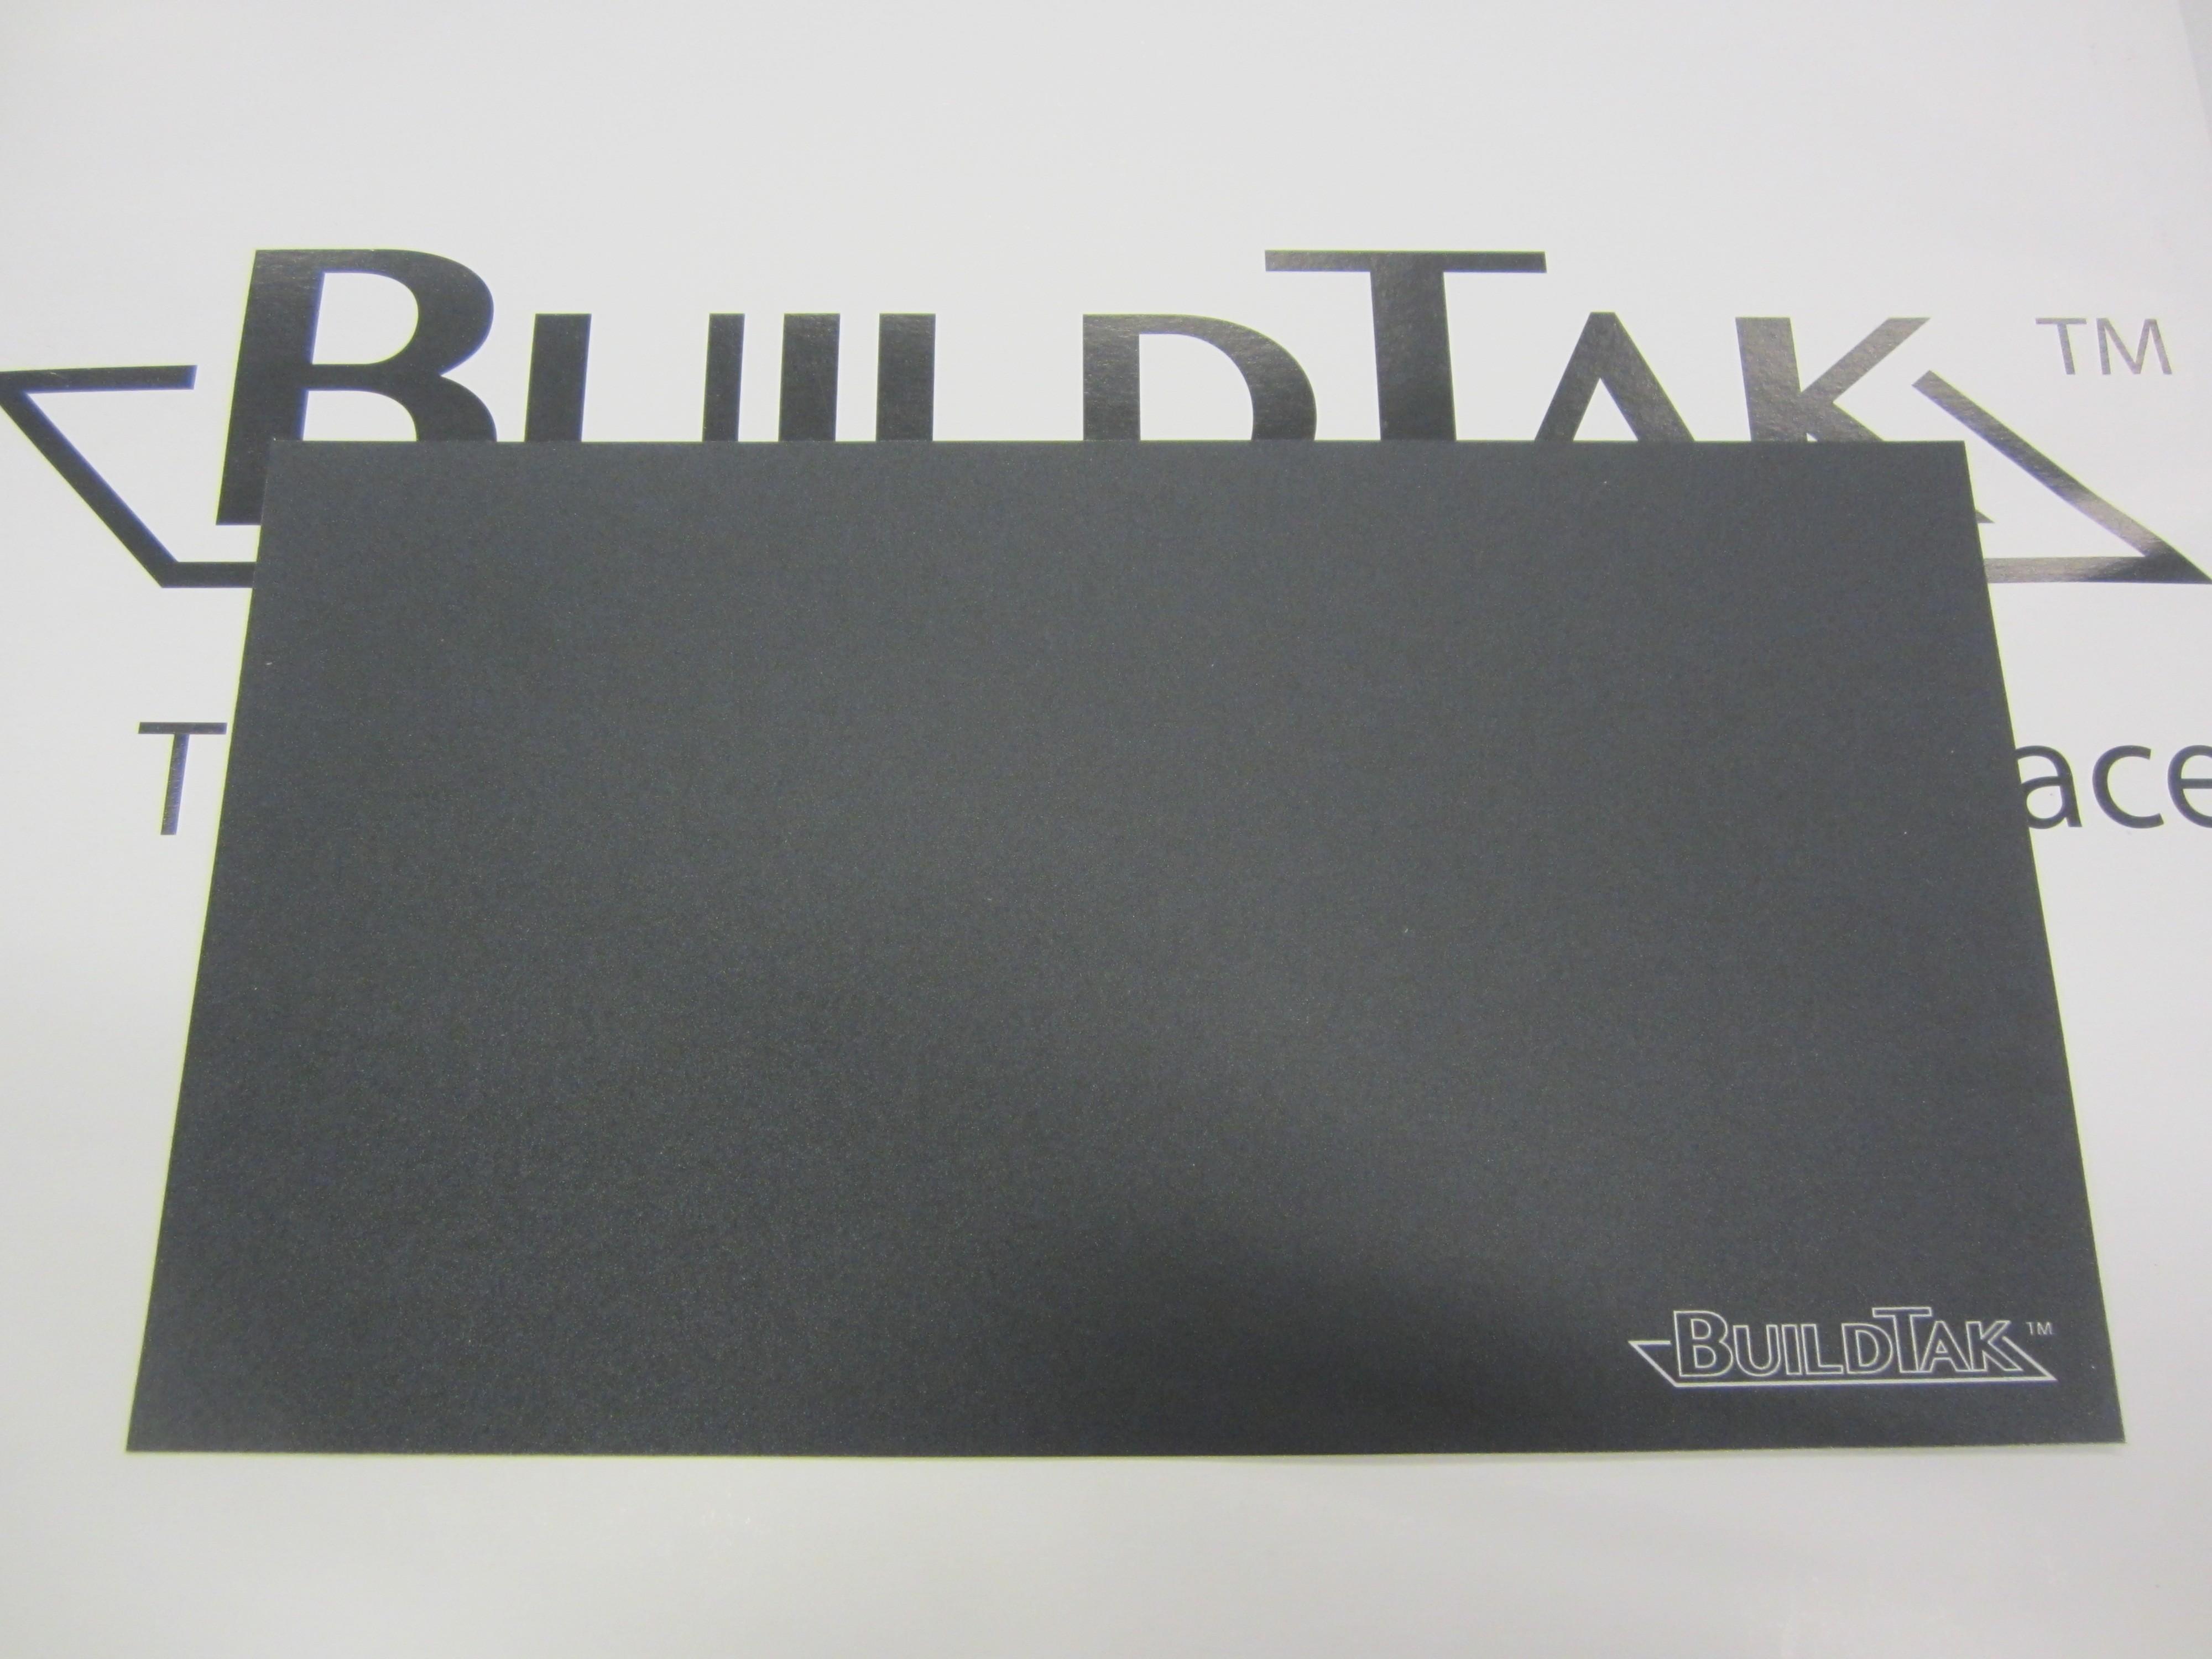 292x165 Buildtak